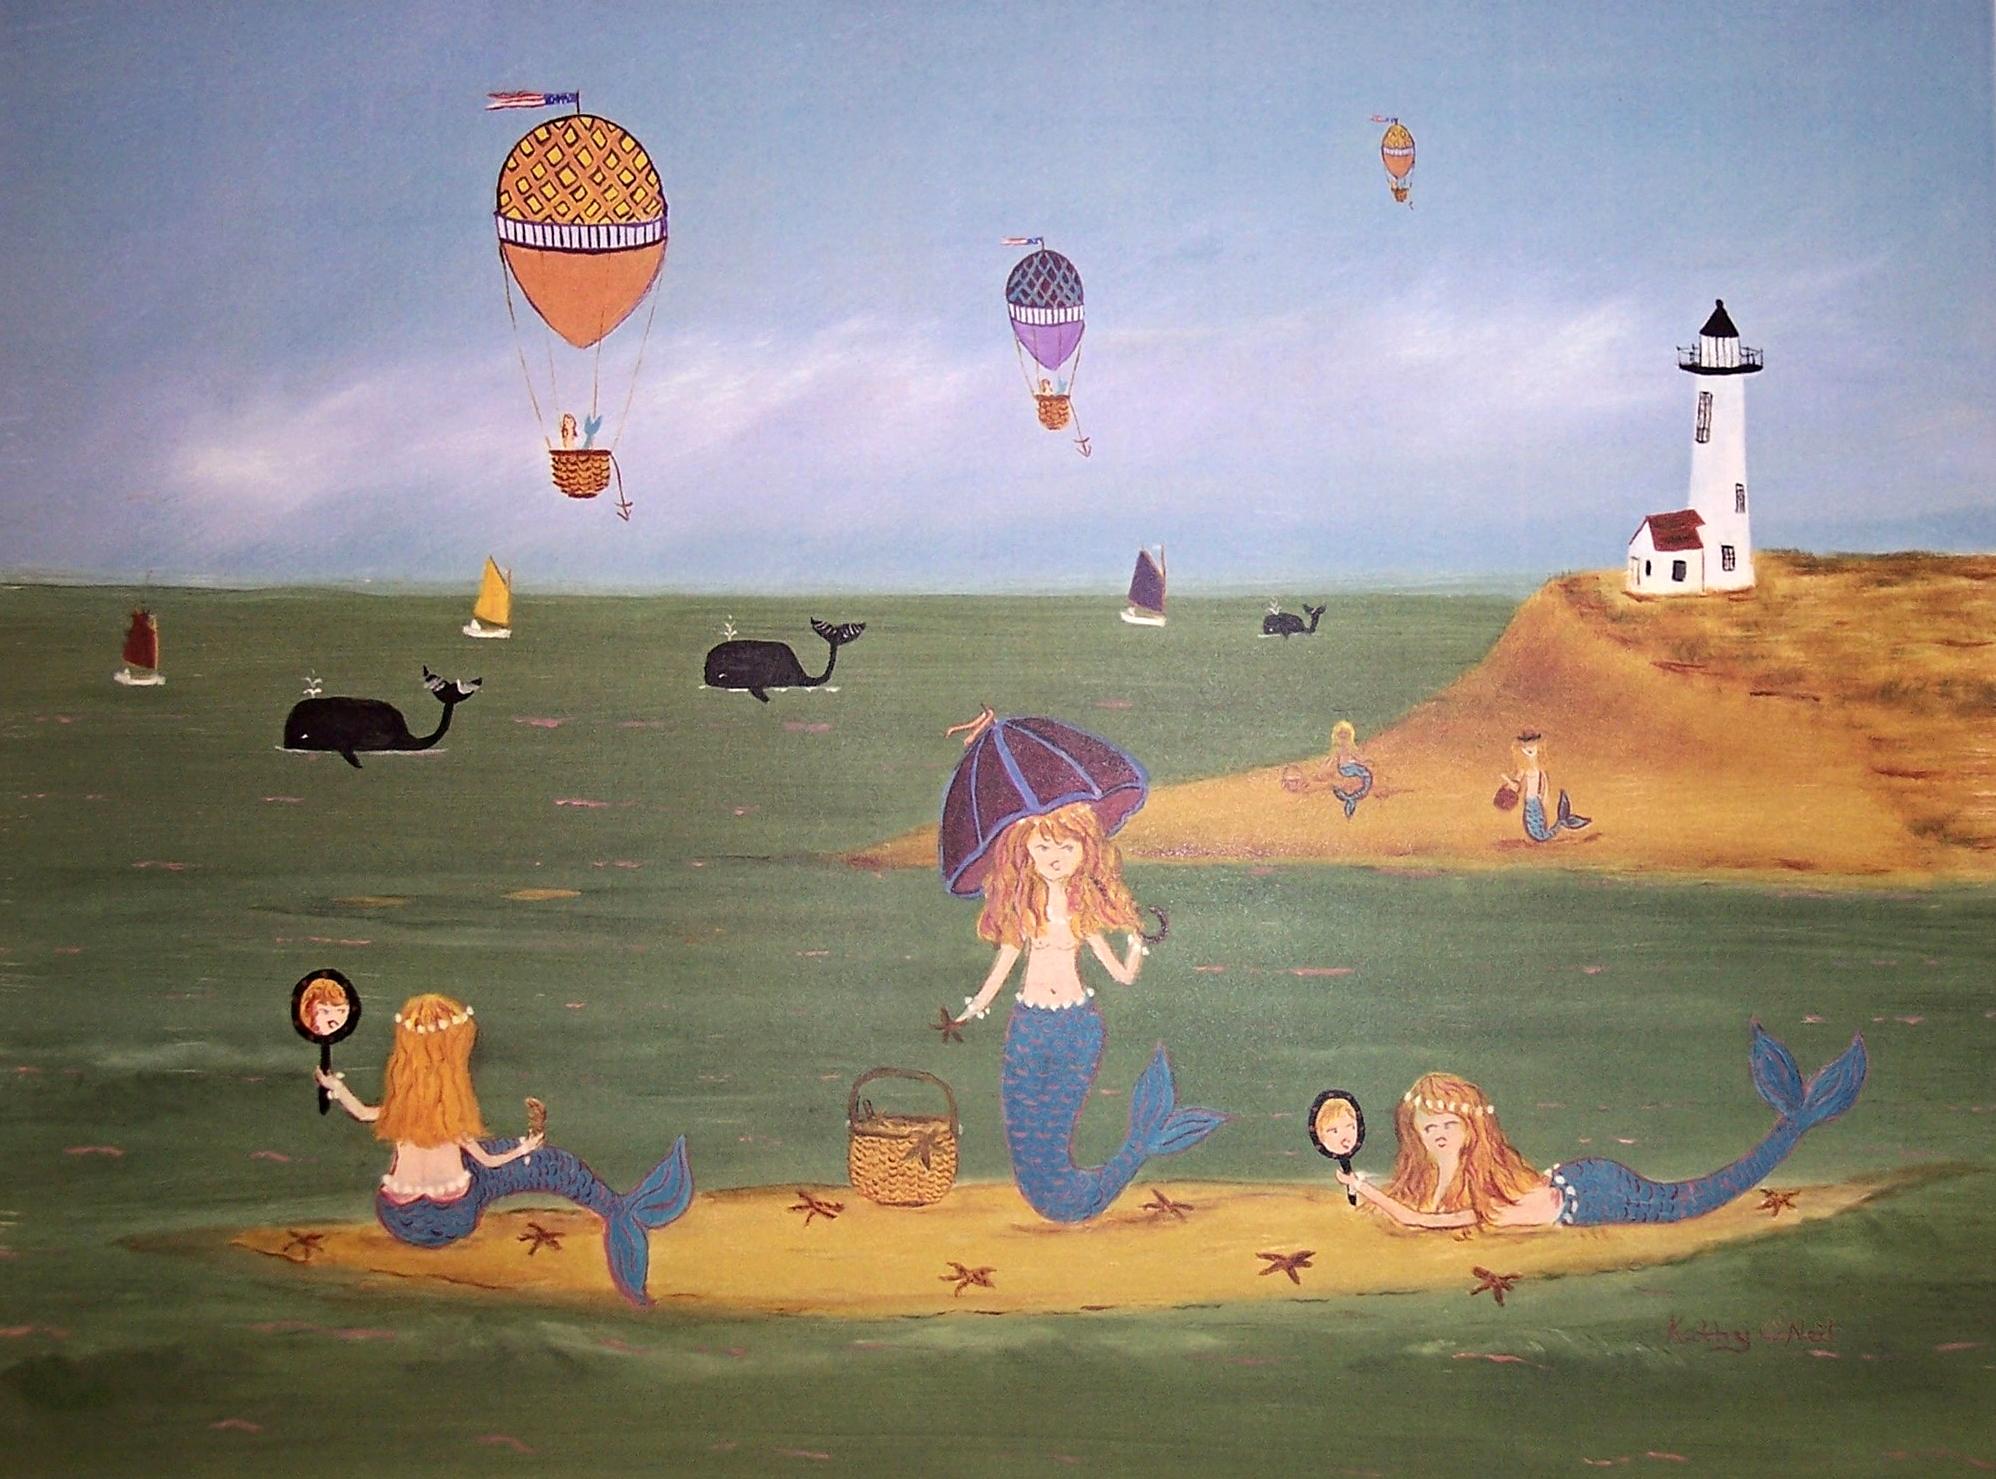 Whimsical Prints by Kathy O'Neil